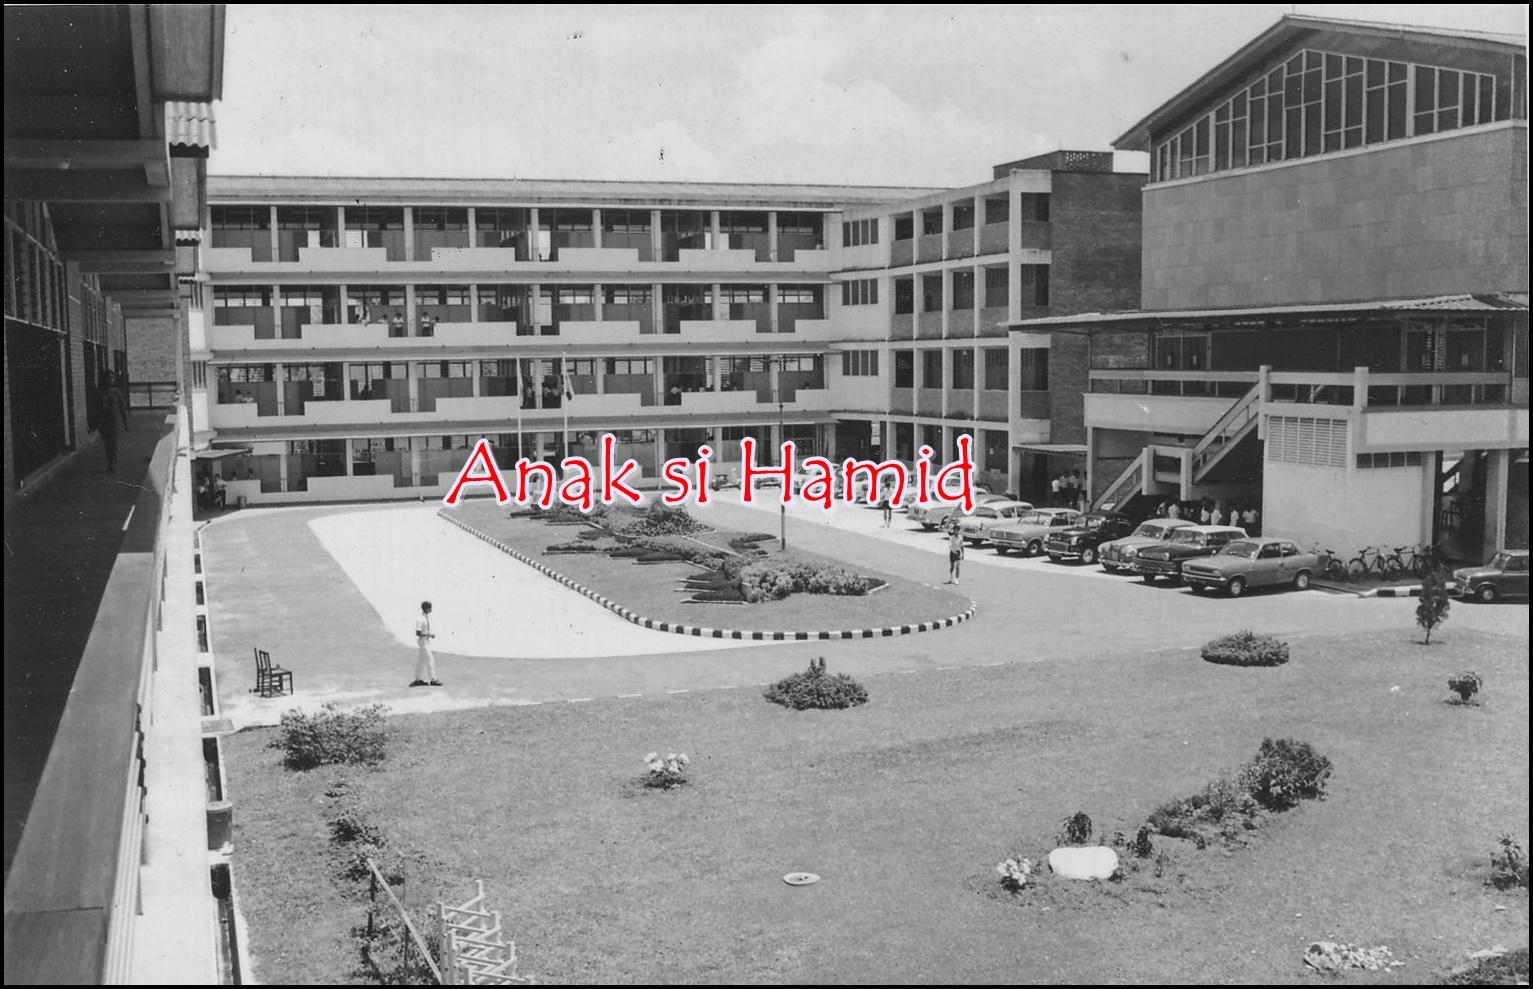 Sekolah Menengah Yusos Ishak Yusof Ishak Secondary School S